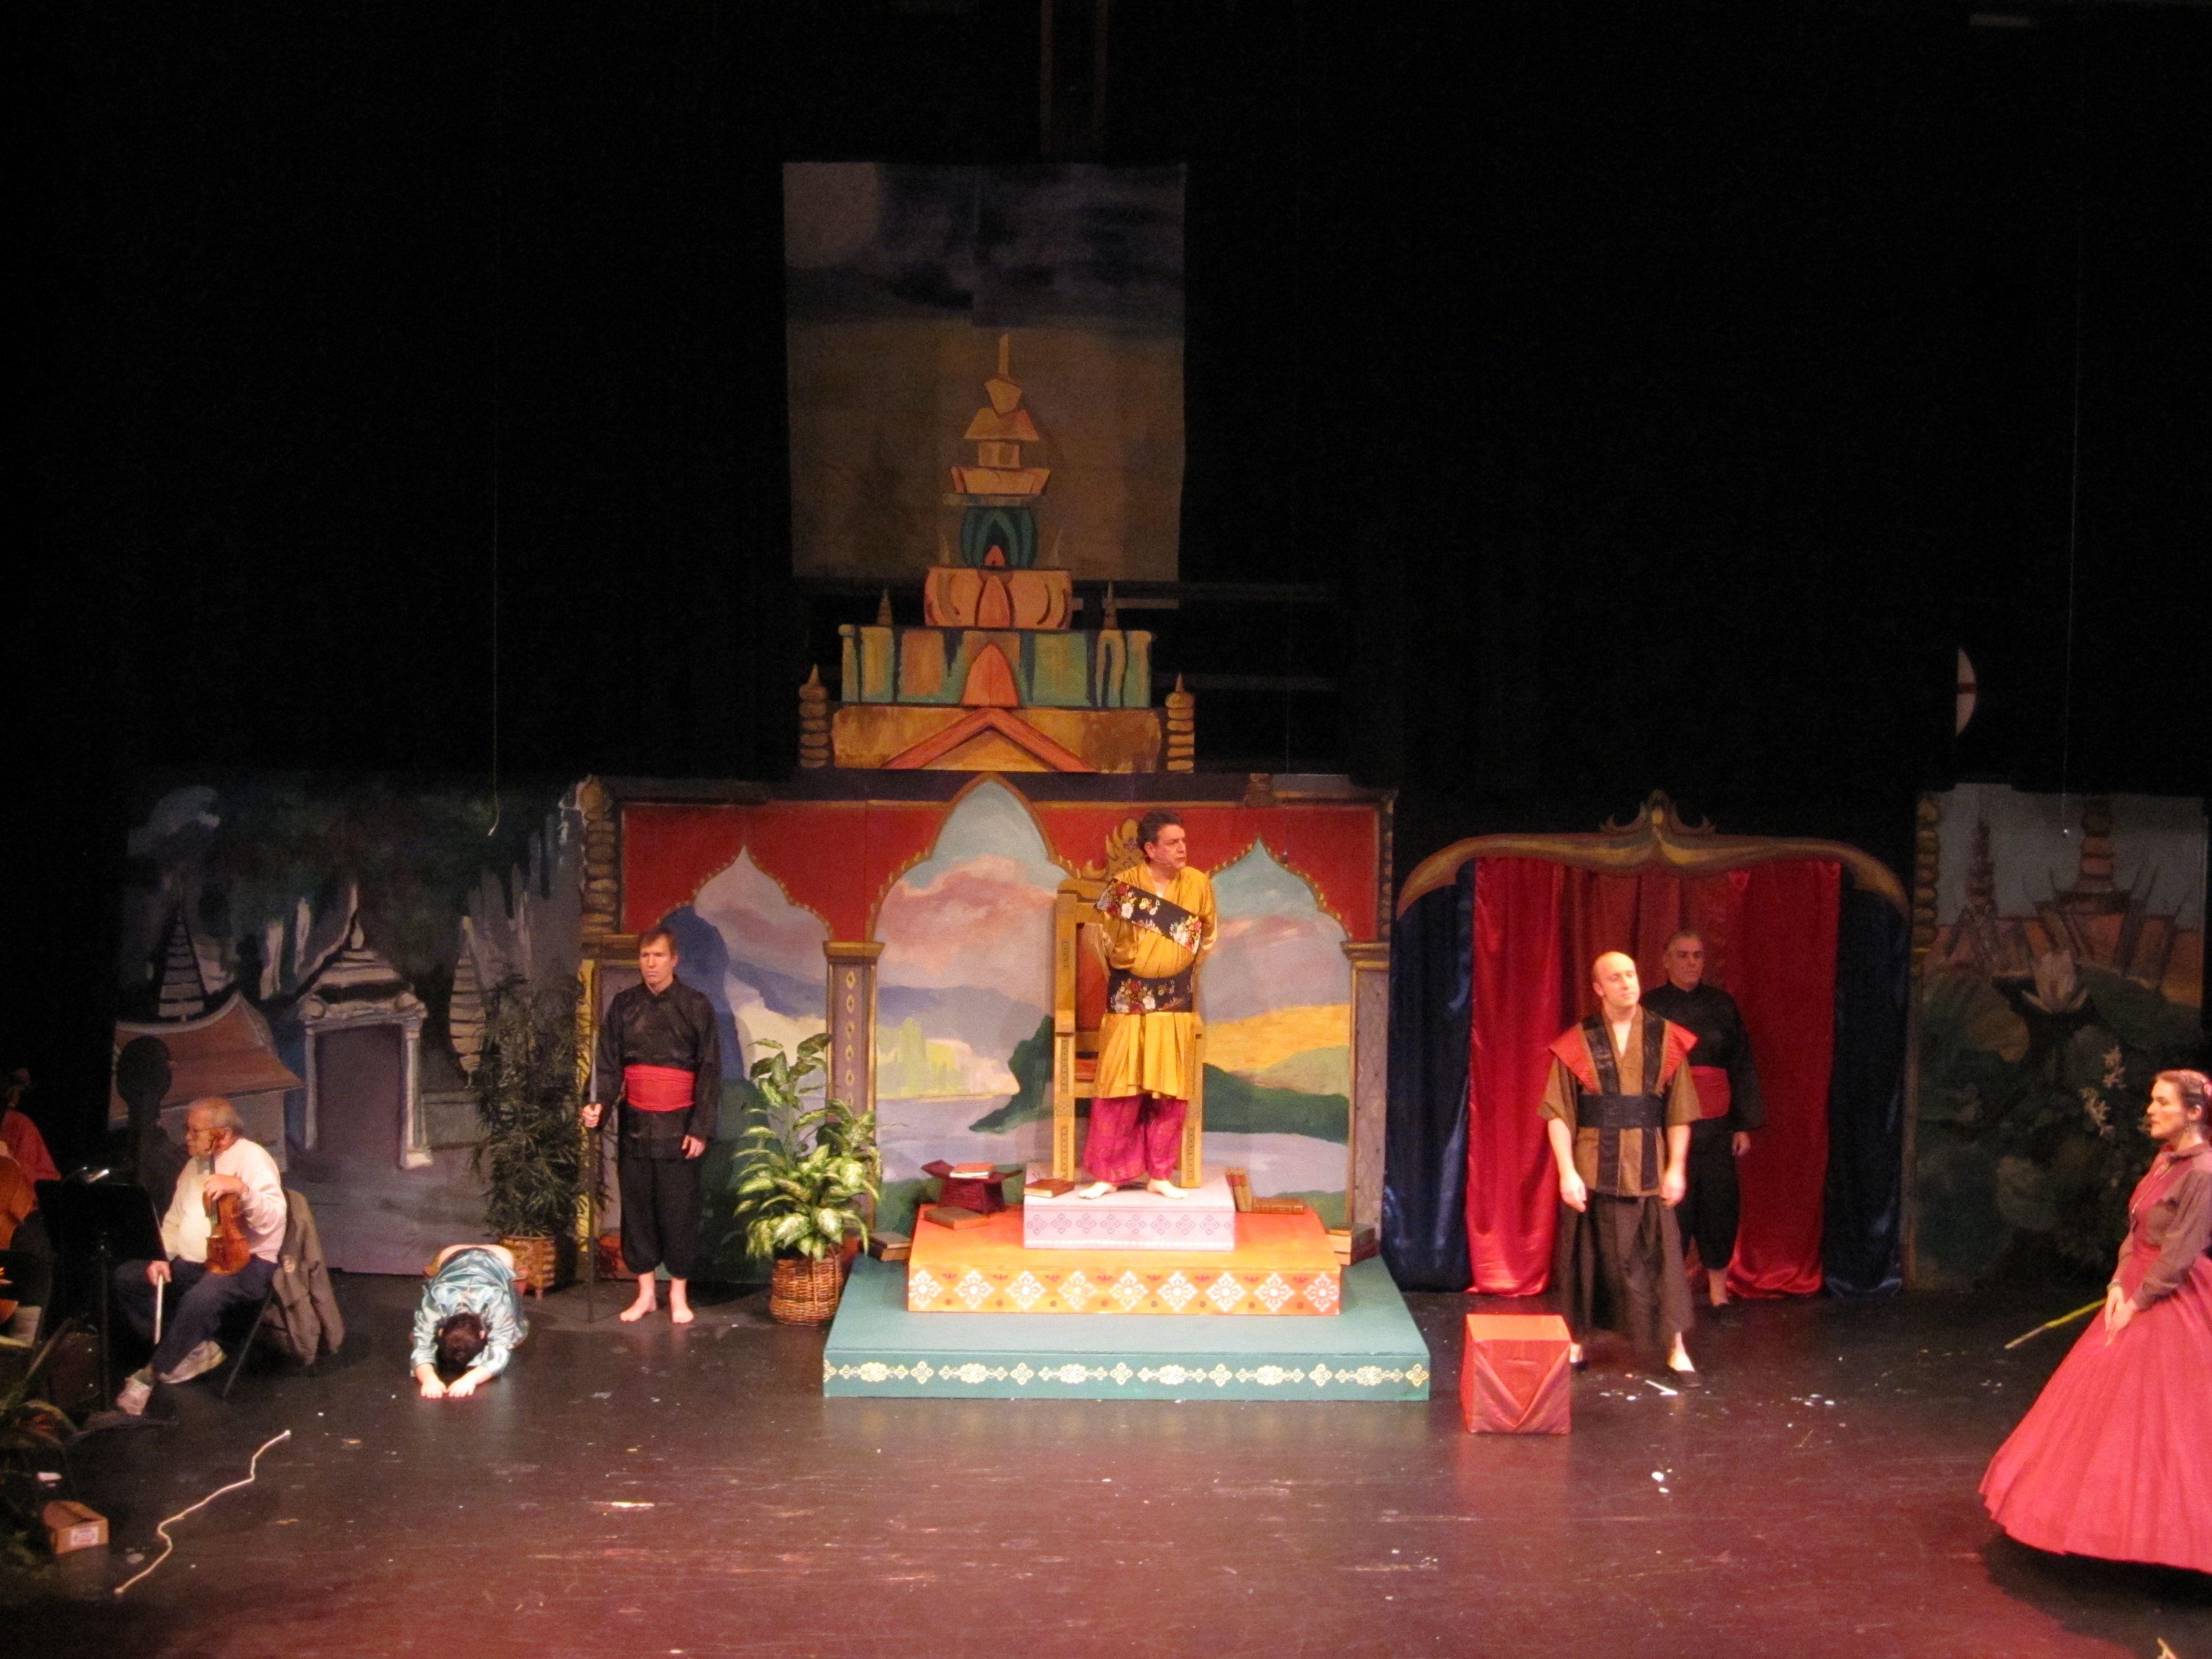 'King and I' set design by Kim Ford Kitz kimfordkitz.com